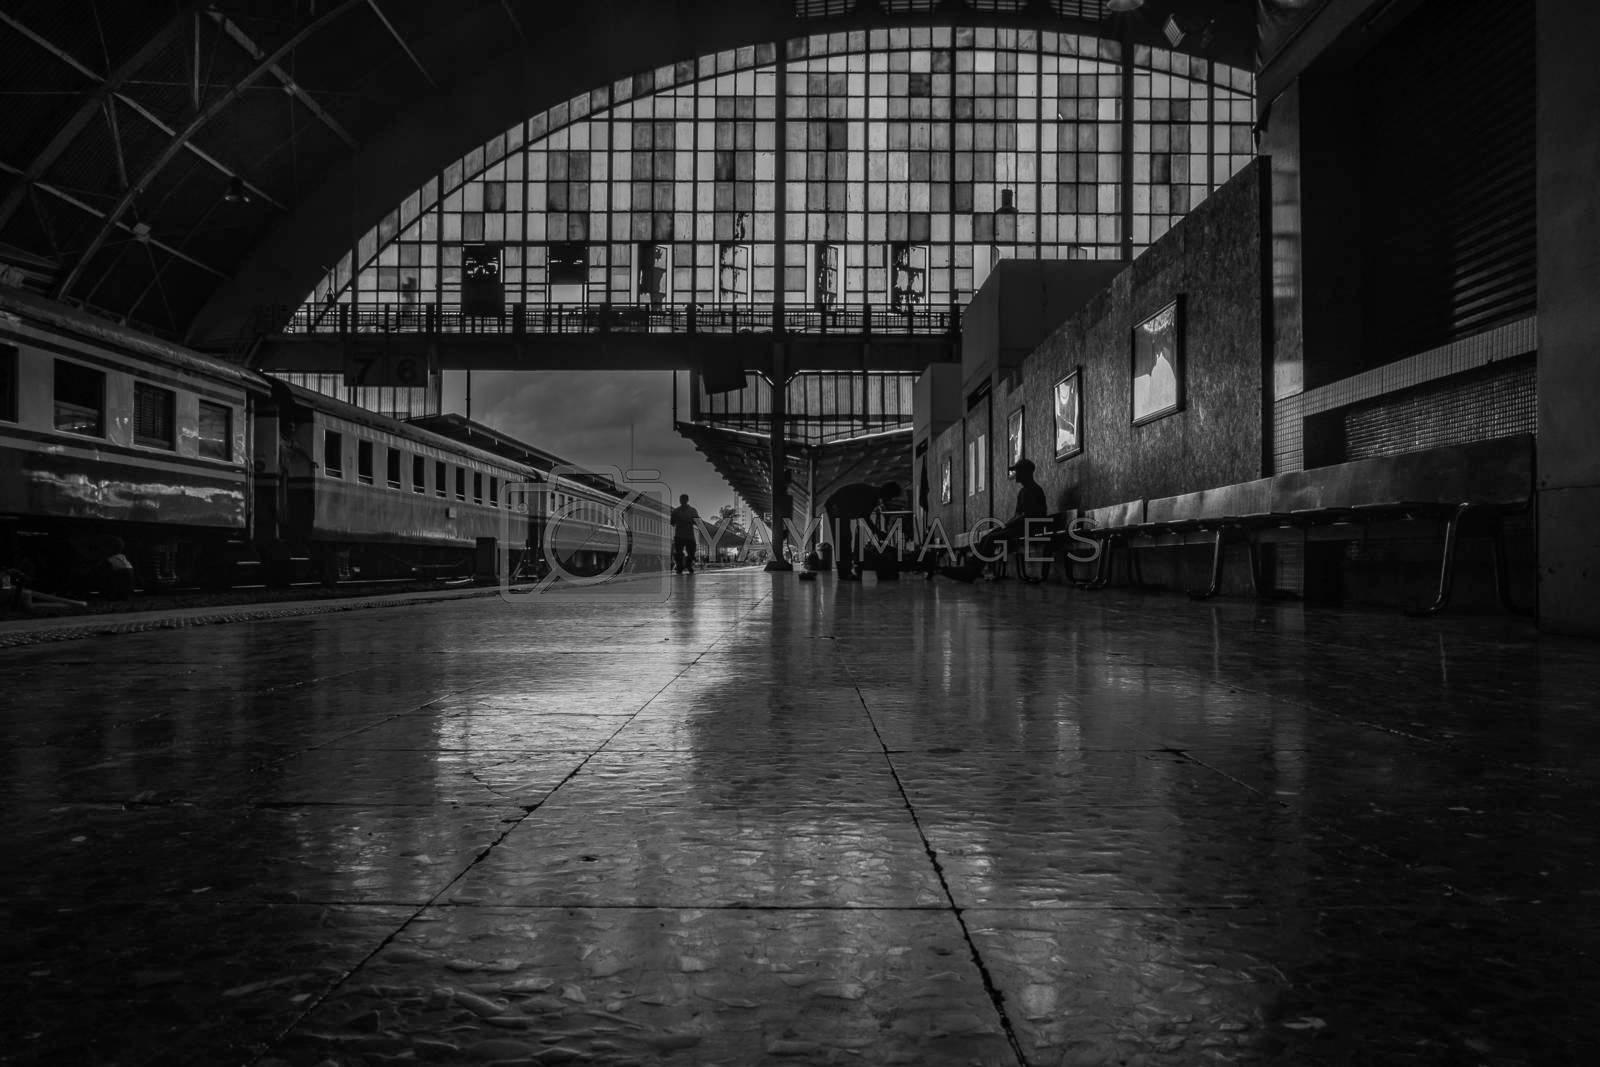 Bangkok, thailand - jun 29, 2019 : Surroundings around Bangkok Railway Station. Bangkok Railway Station or Hua Lamphong Station is the main railway station in Bangkok, Thailand, Black and white.